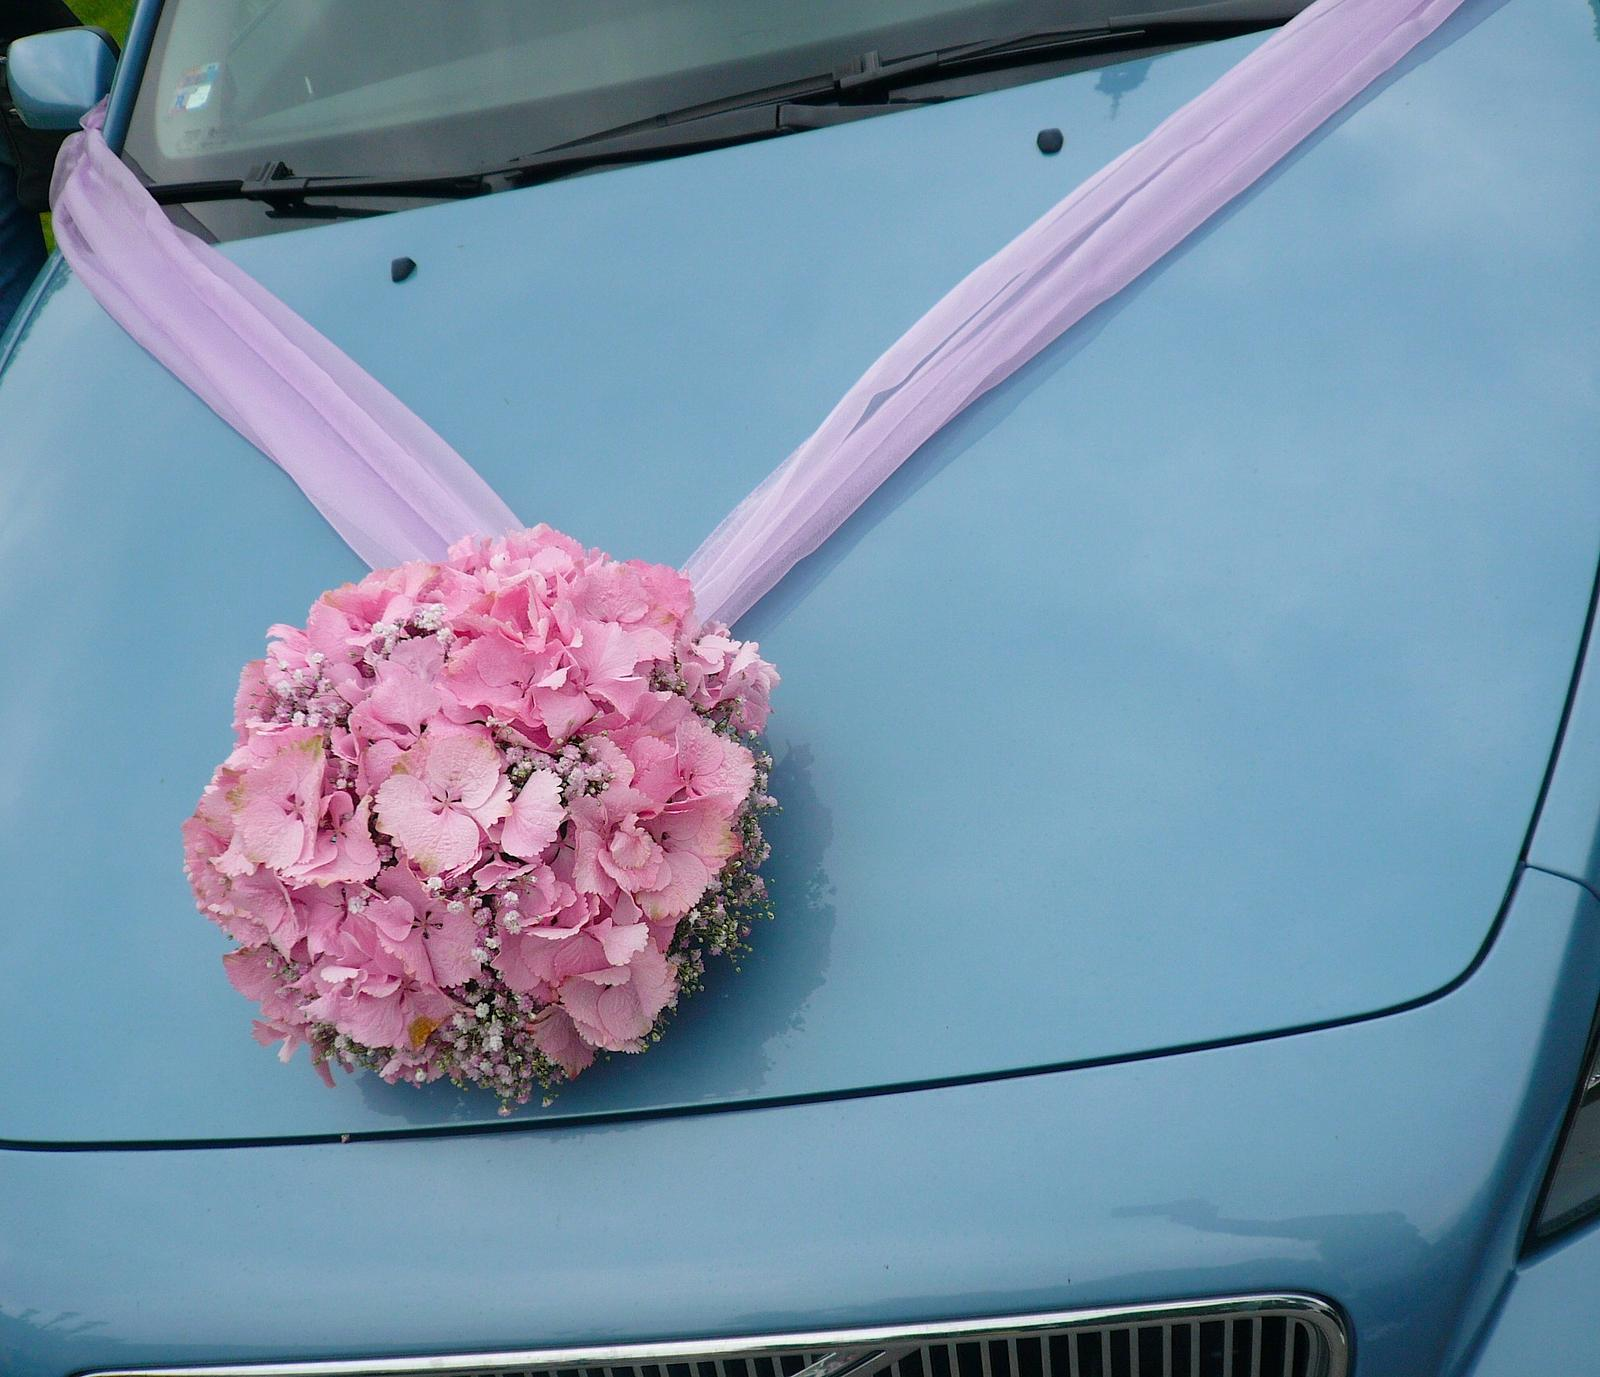 Ozdoba auta z hortenzií - Obrázek č. 1